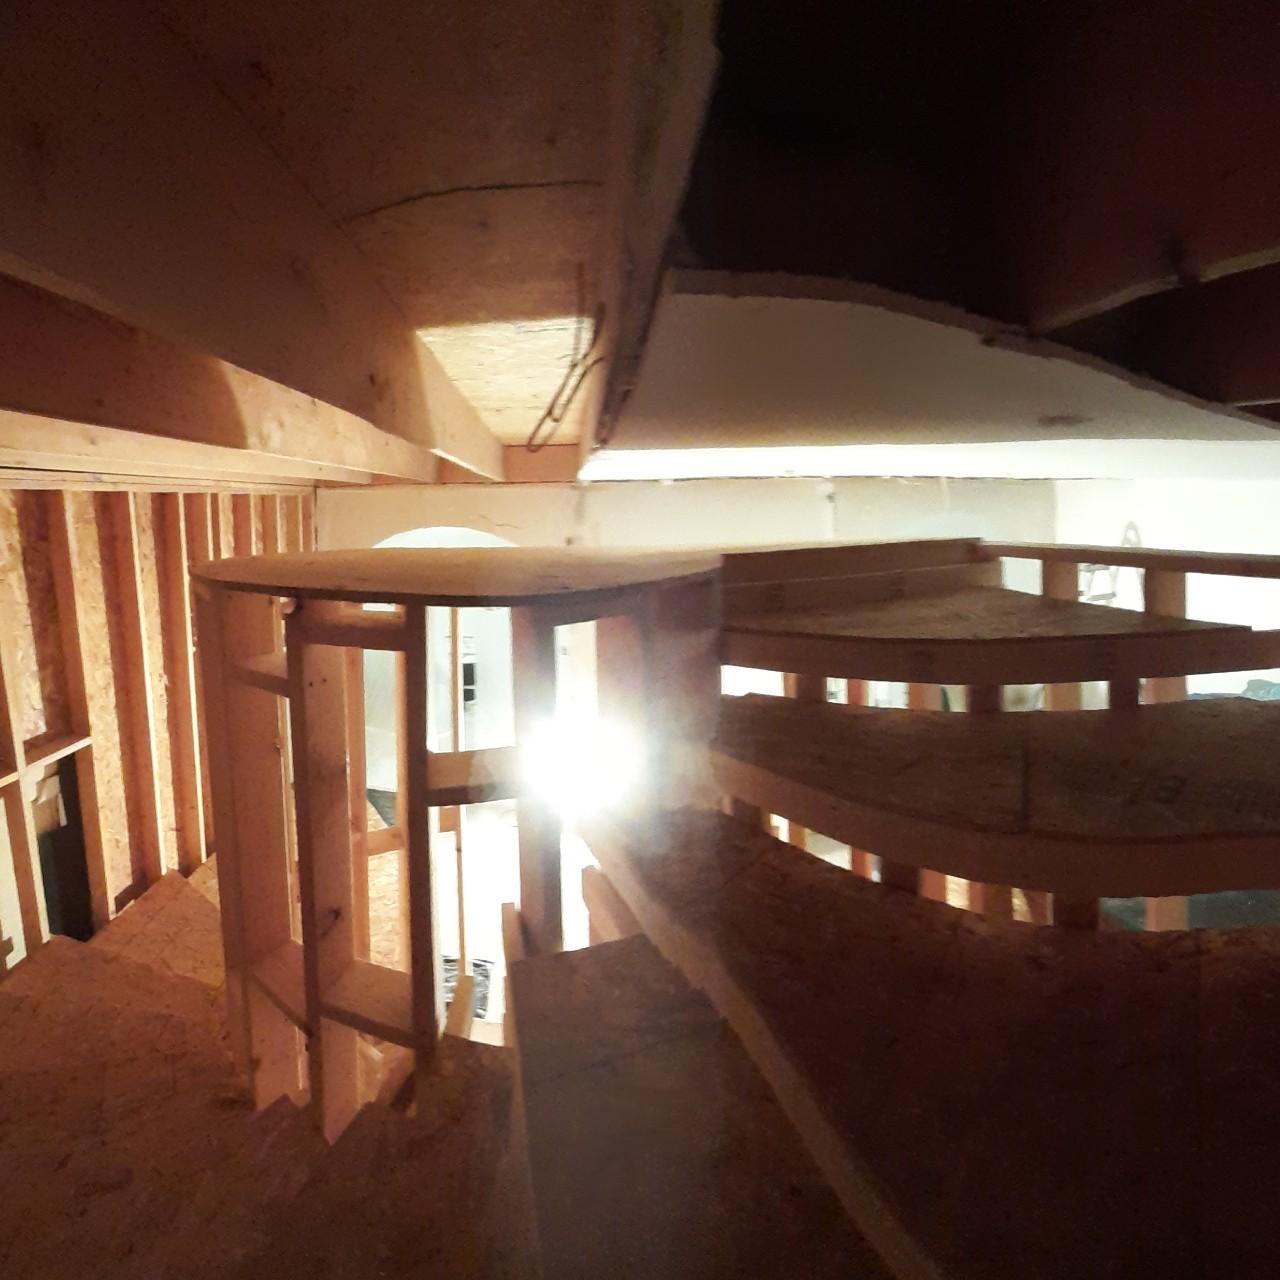 carpentry-wood-framing-second-floor-home-addition--framing-38